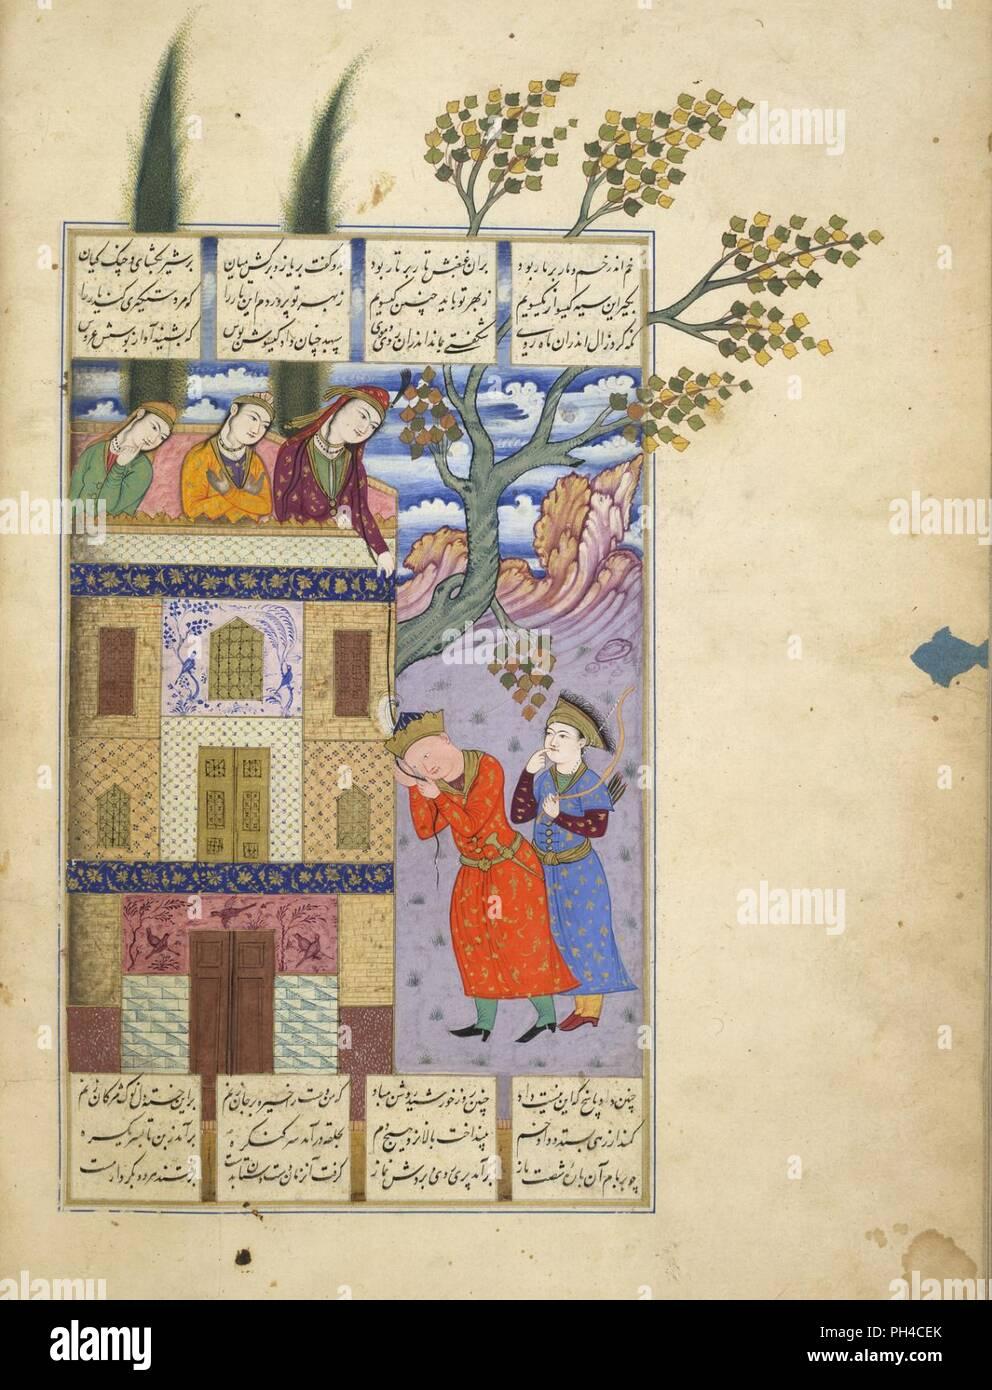 Shahnama. - 'Rudaba and Zal' . - Stock Image